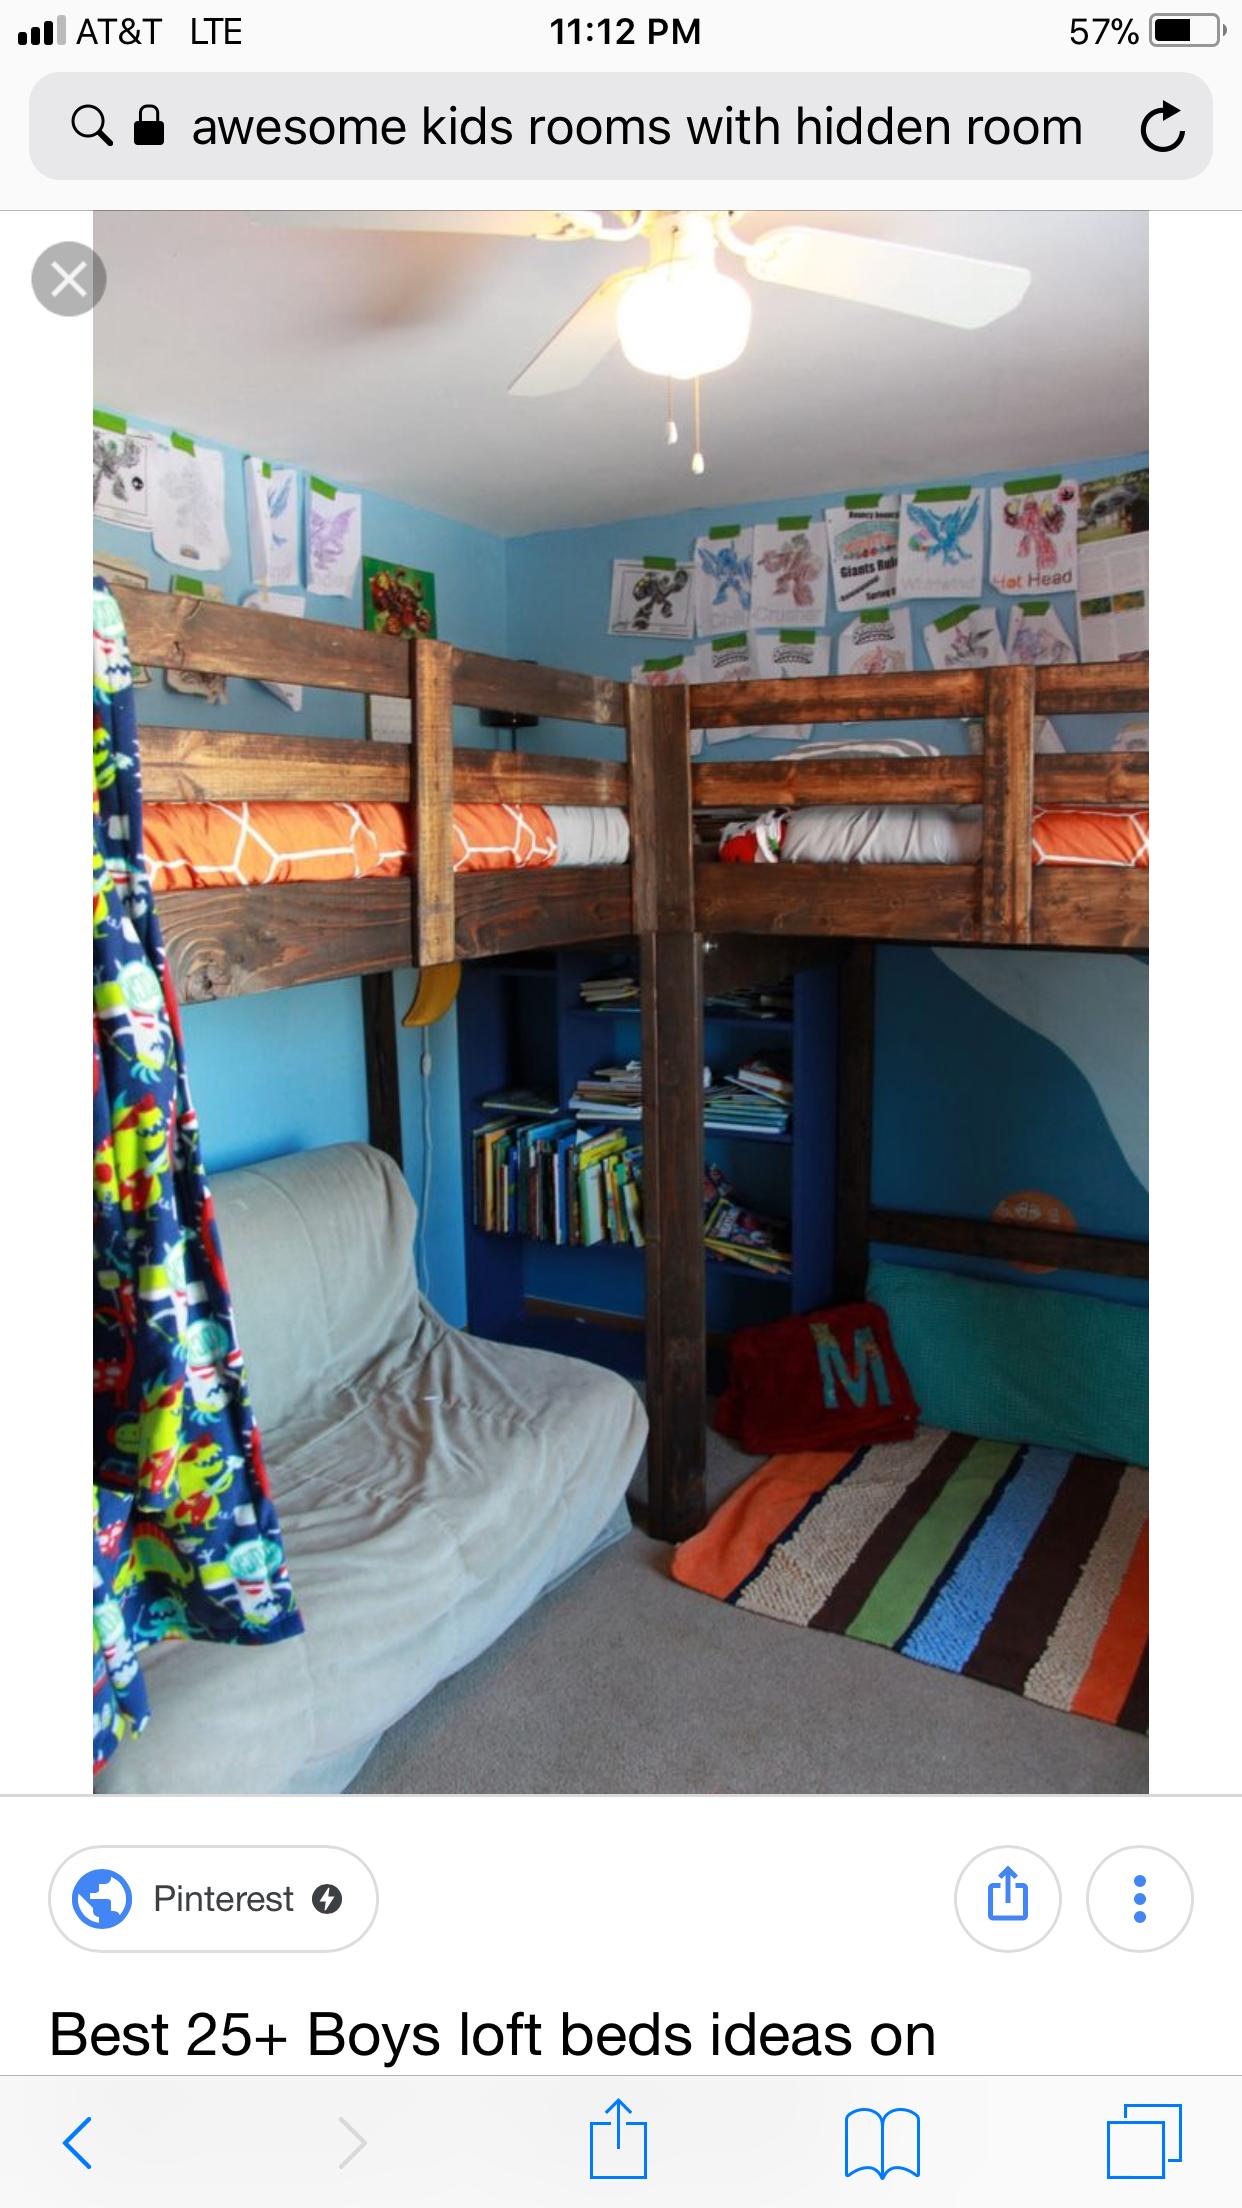 Childrens loft bedroom ideas  Pin by Jenn Parker on Bedrooms ideas  Pinterest  Room Bedroom and